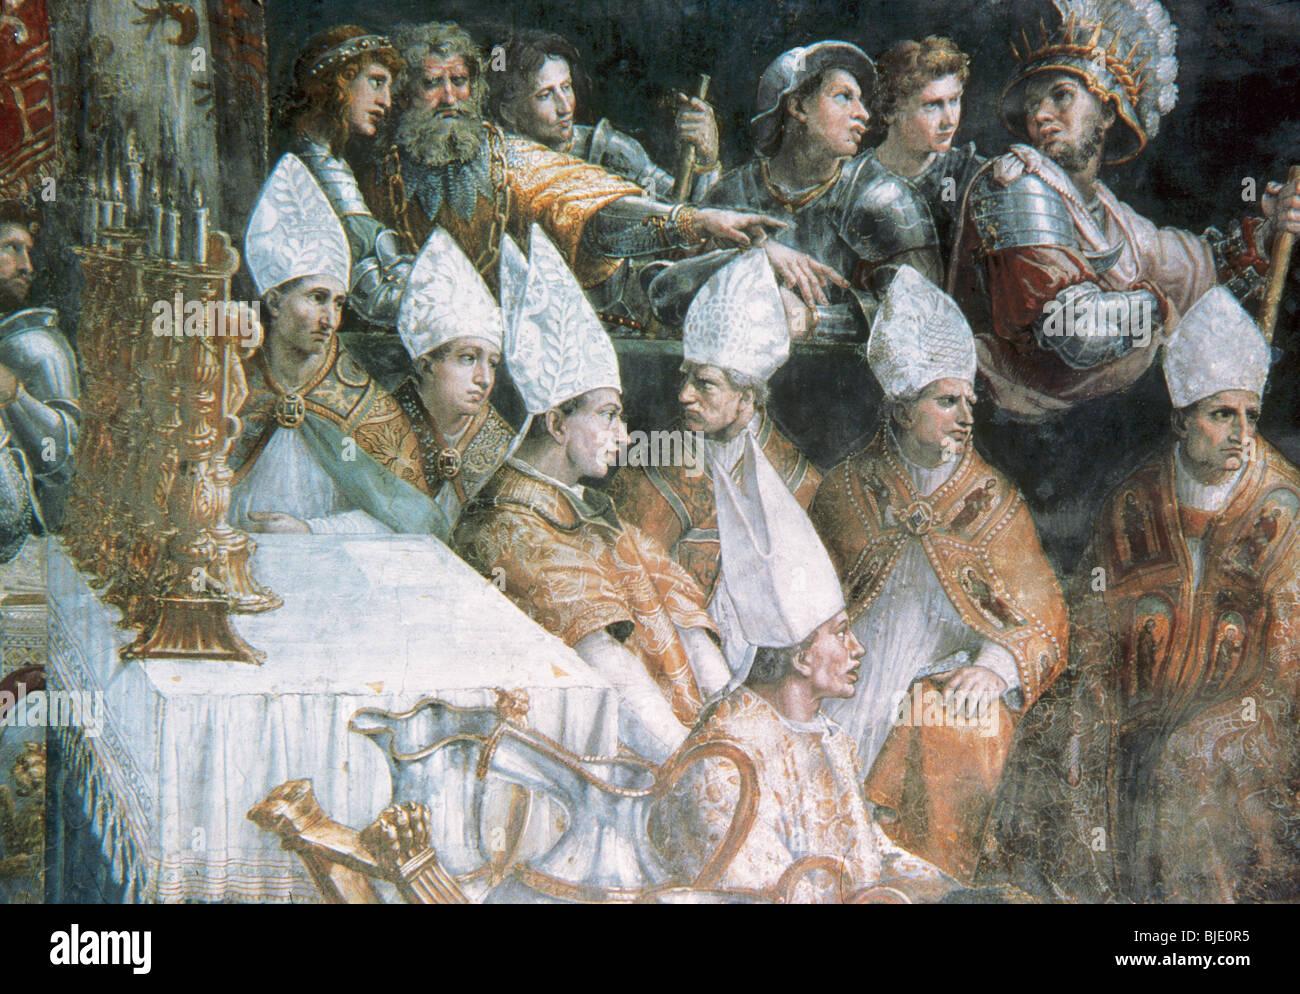 Rafael, Raffaello Santi o Sanzio, llamado (Urbino, 1483-Roma, 1520). Pintor italiano. La coronación de Carlomagno. Imagen De Stock